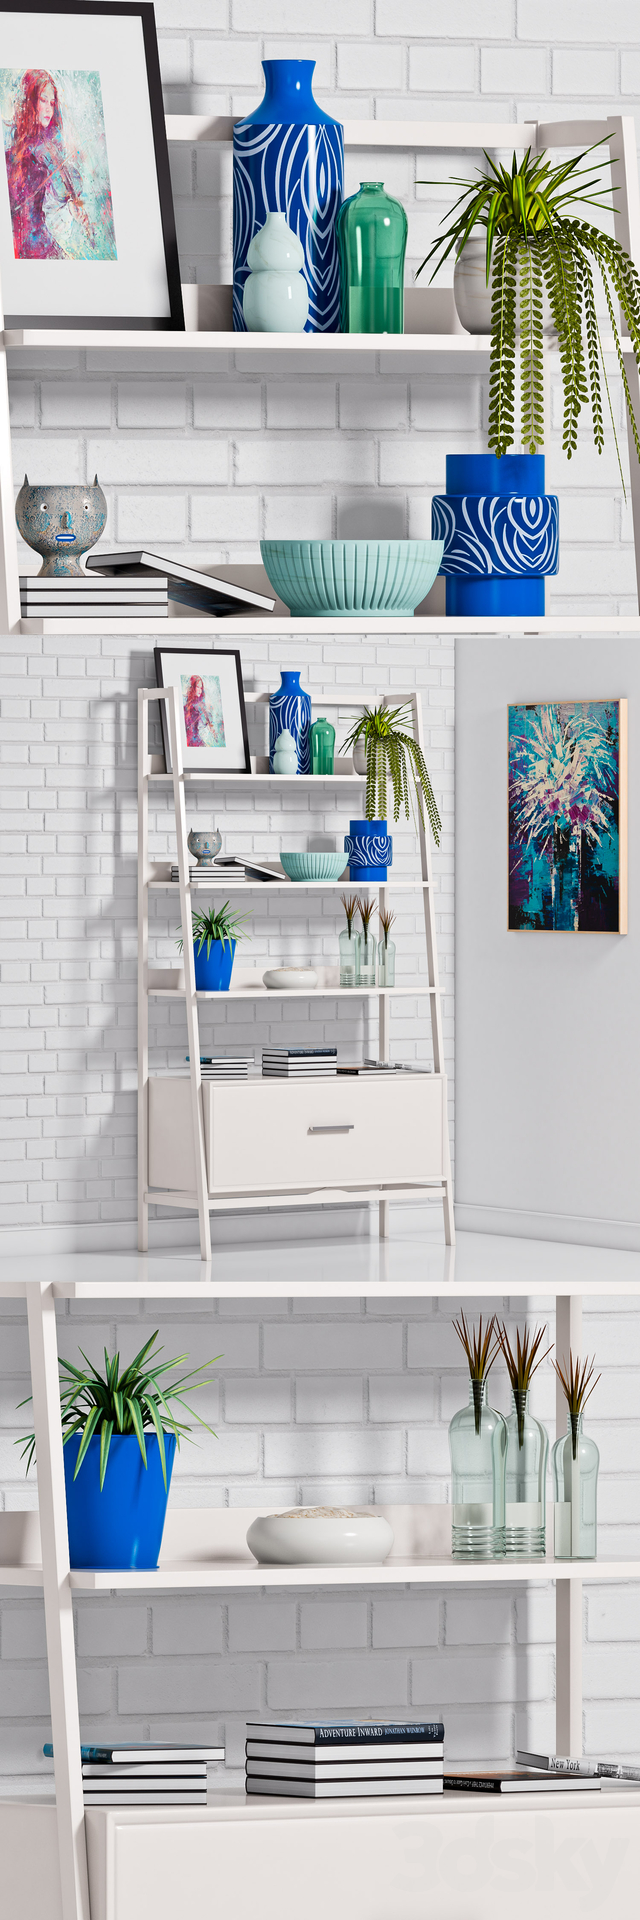 Decorative shelf -1